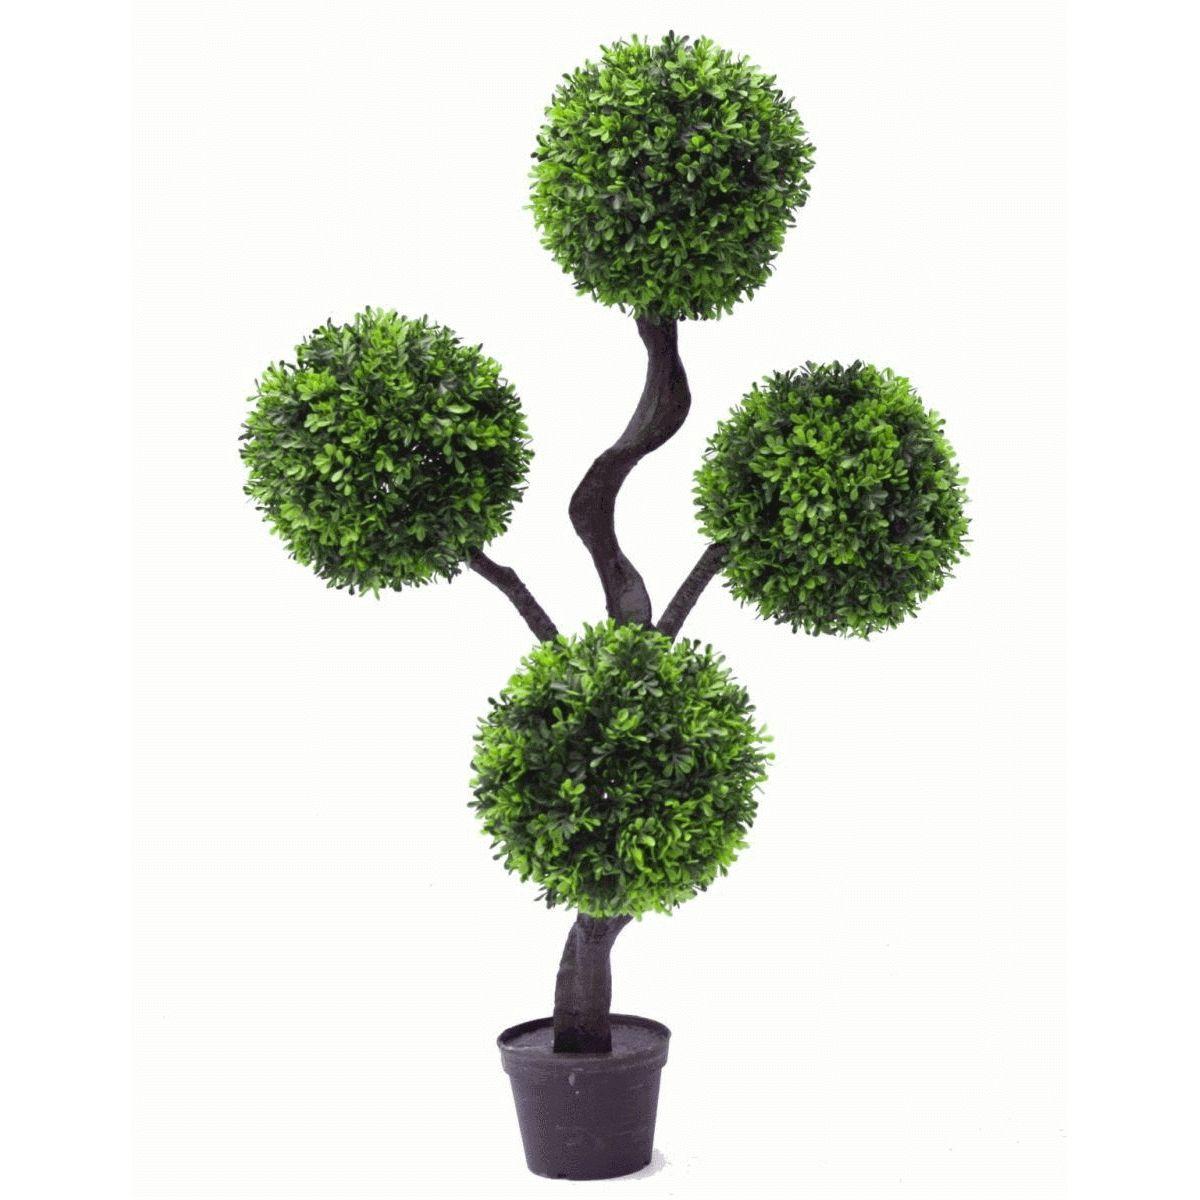 90cm 3ft large artificial plant boxwood realistic. Black Bedroom Furniture Sets. Home Design Ideas